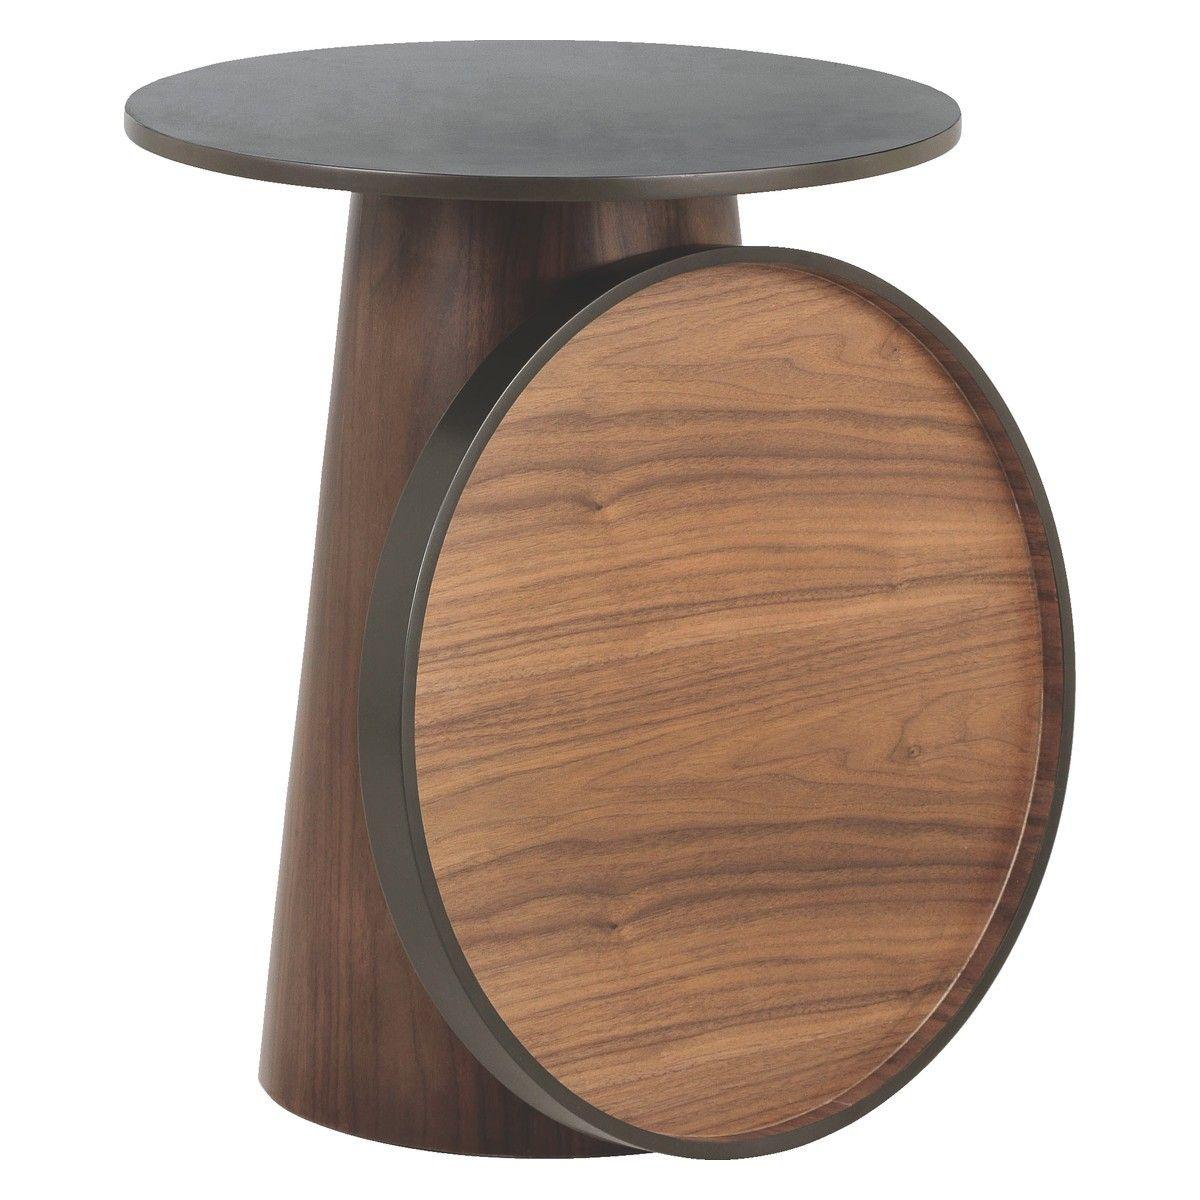 Brodi Walnut Side Table Buy Now At Habitat Uk Walnut Side Tables Side Table Table